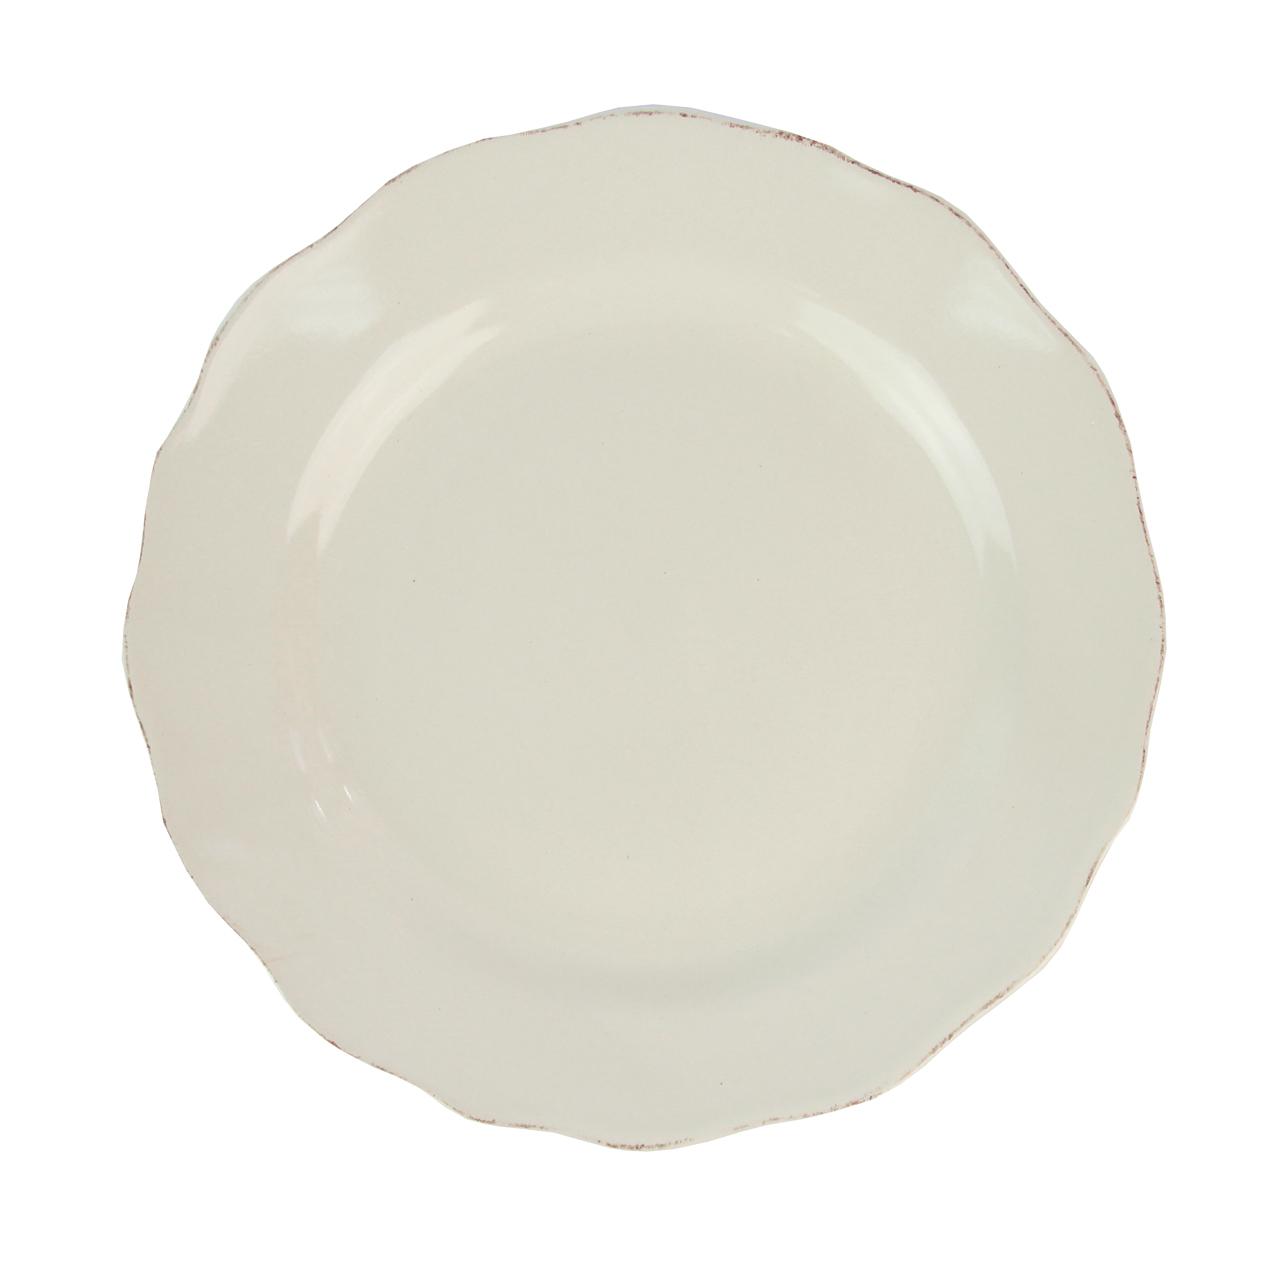 Farfurie Plata Din Ceramica Bej 21 Cm